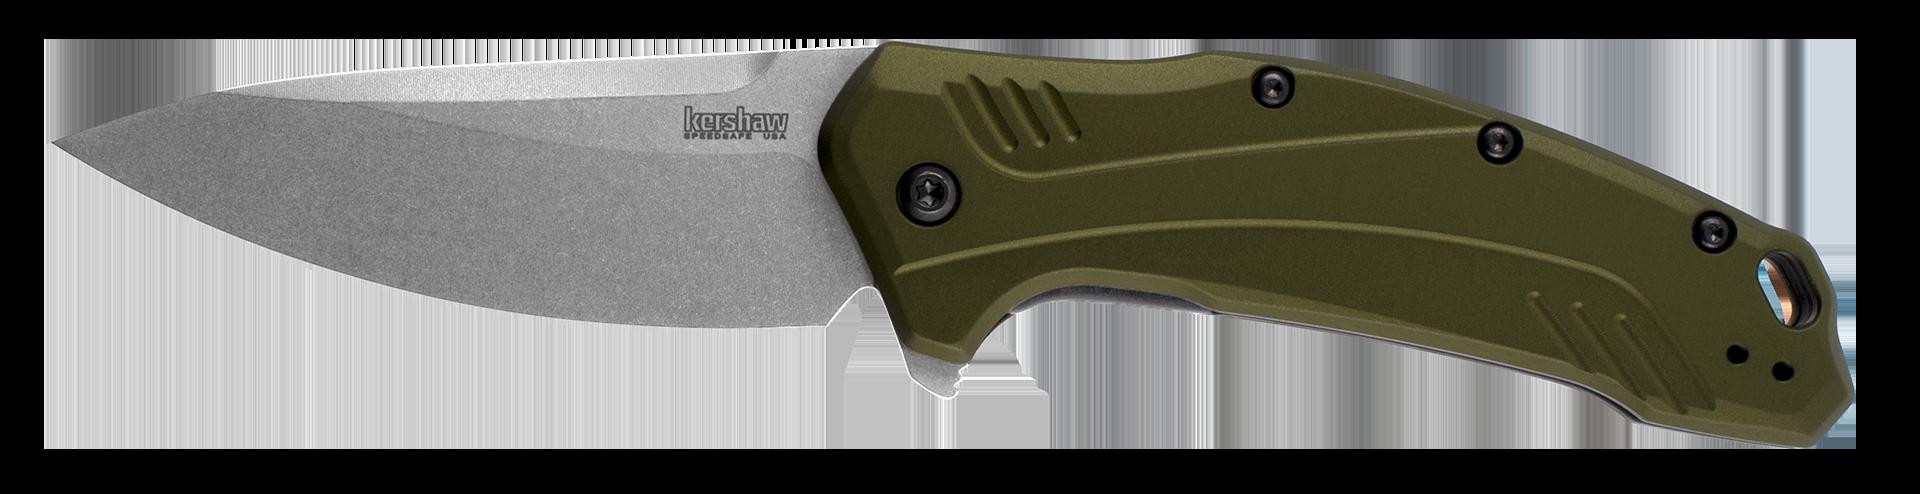 Kershaw Olive Green Anodized Aluminum Link Liner Lock 20CV Stainless Pocket Knife